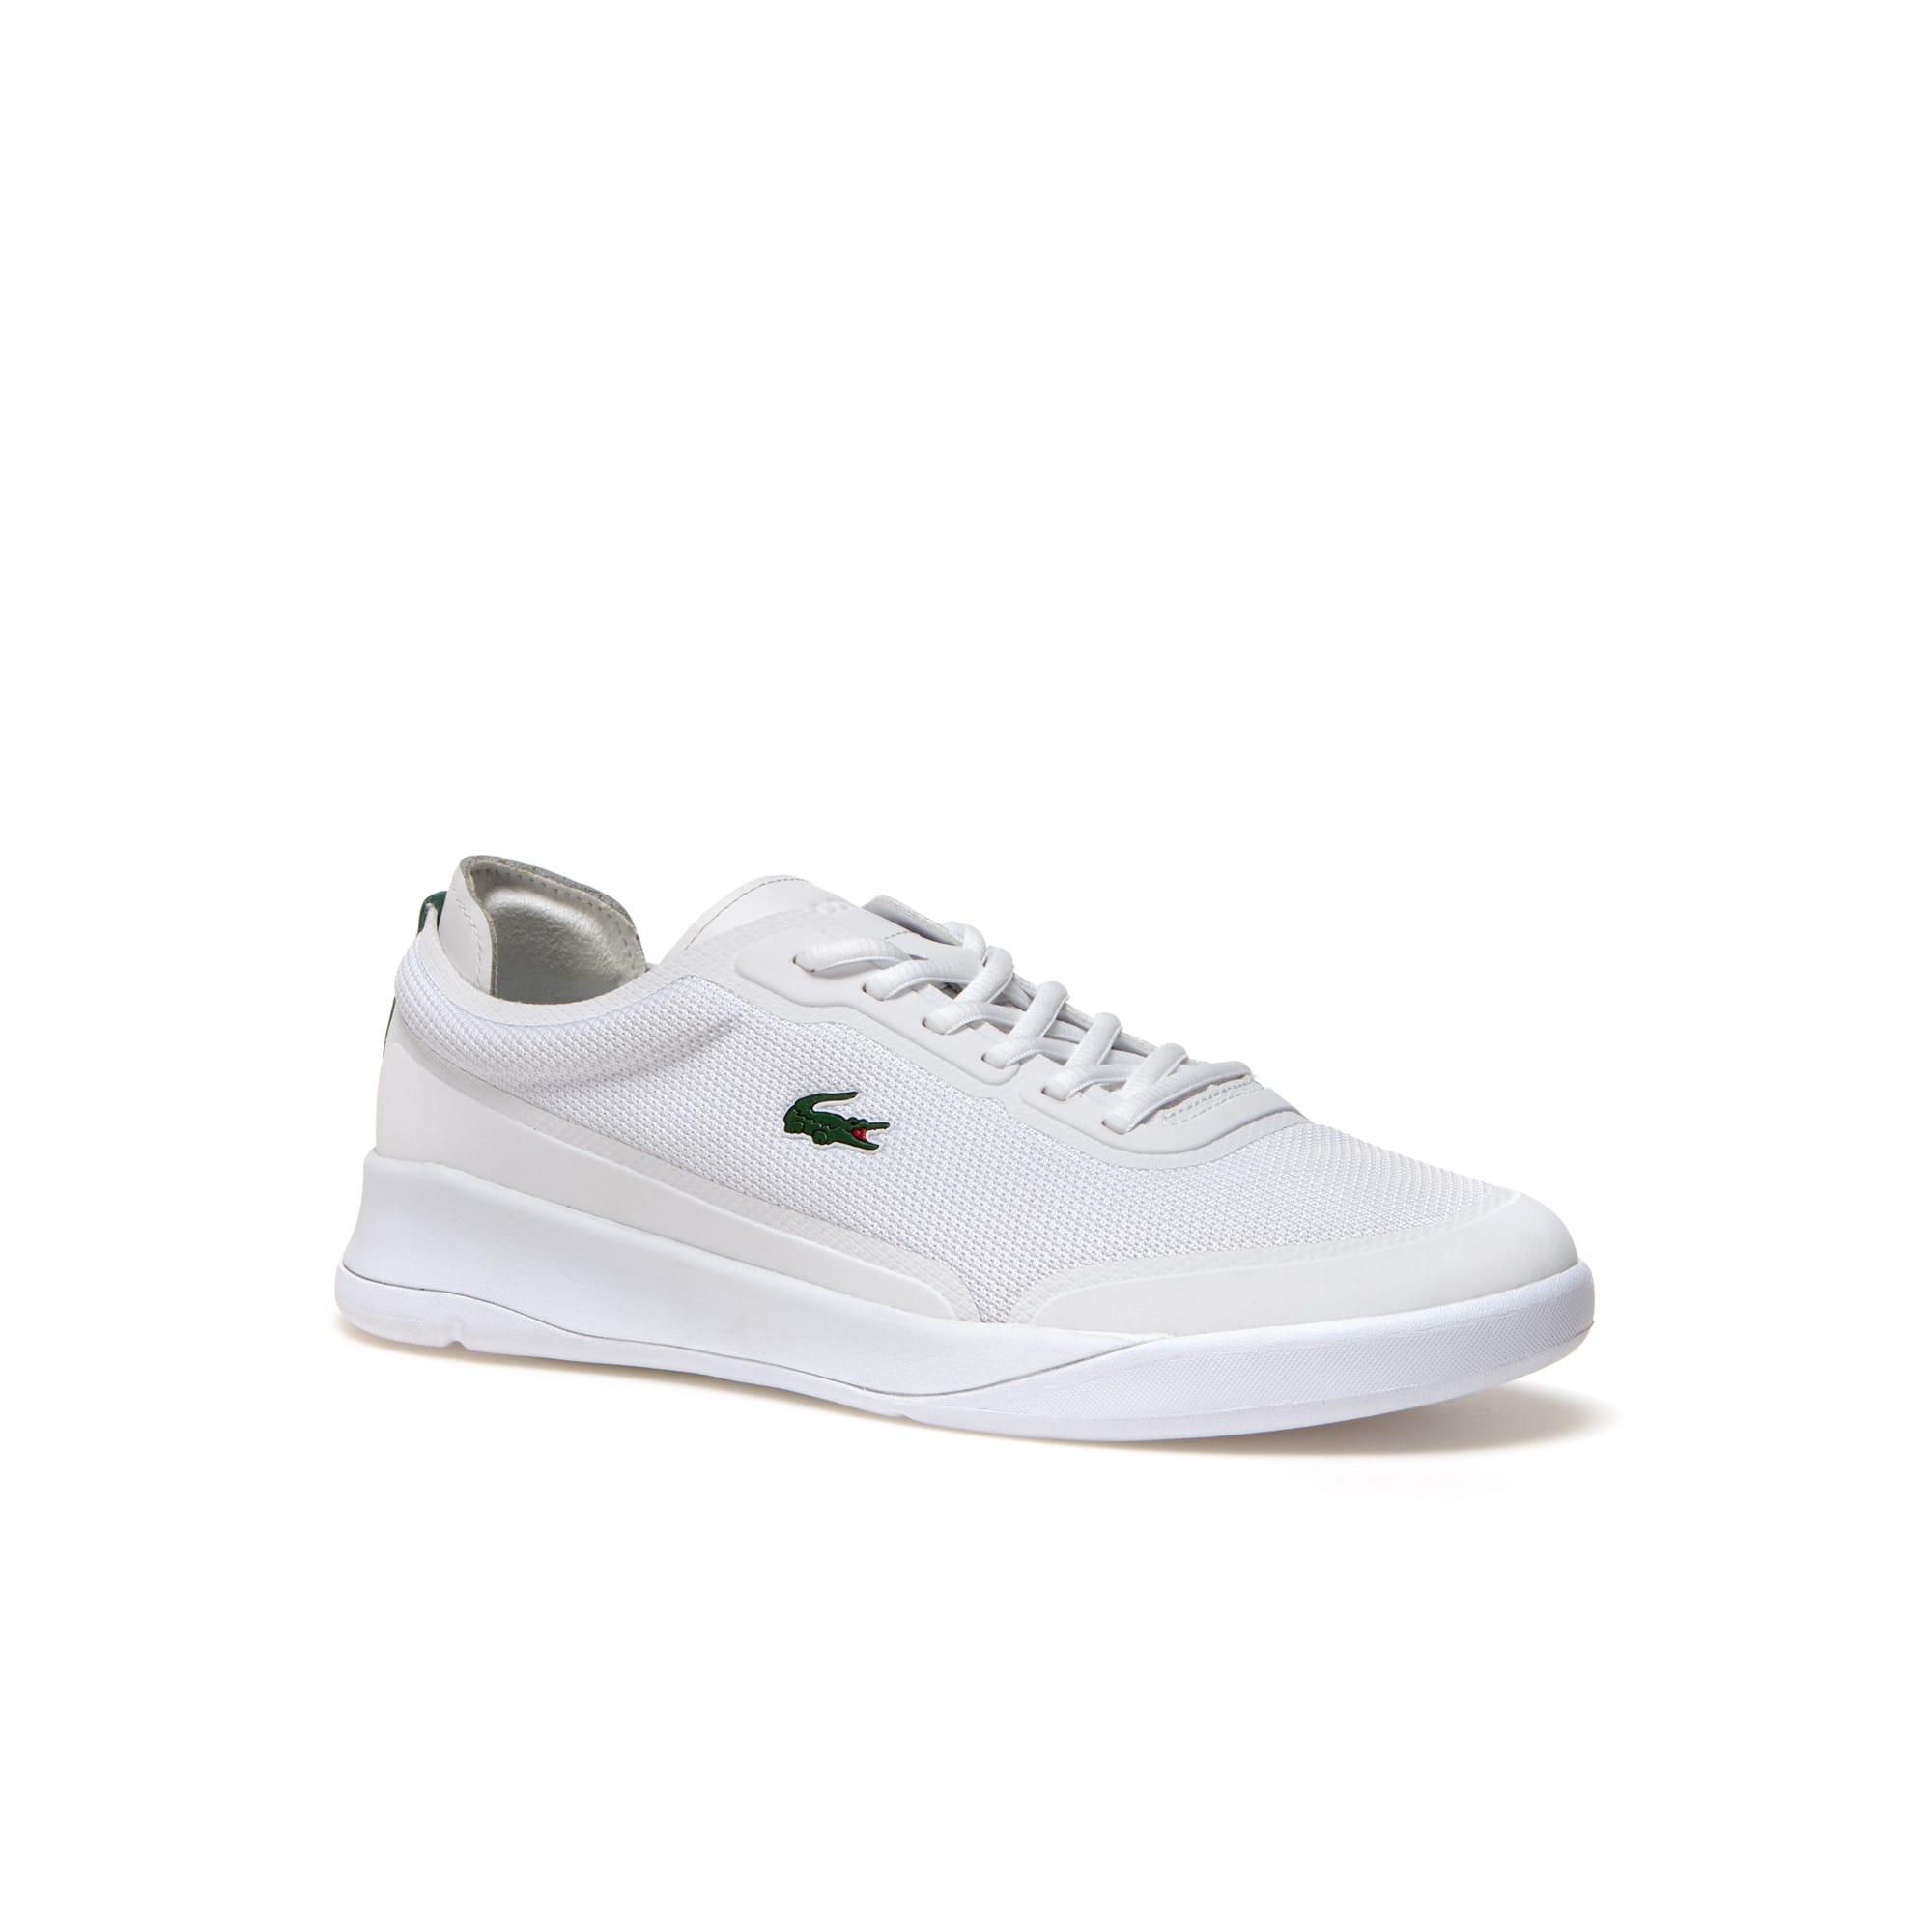 Men's LT Spirit Elite Piqué Canvas Sneakers